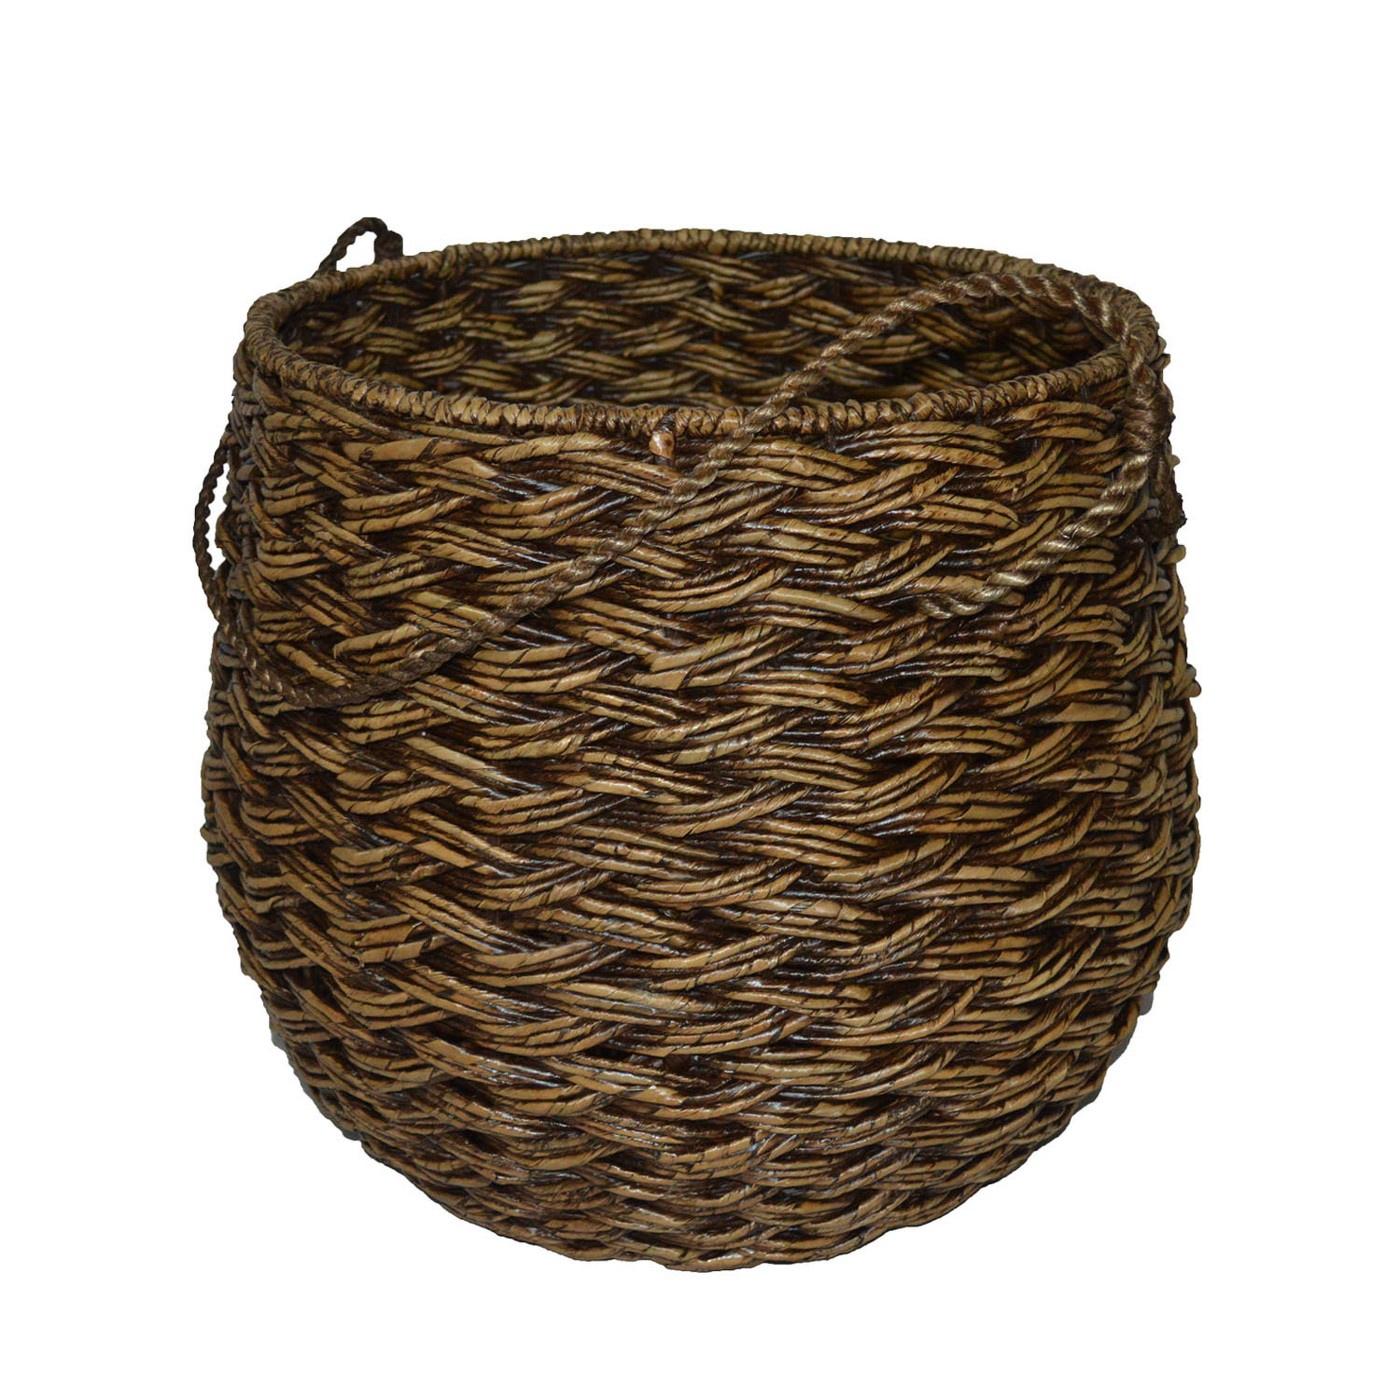 Large Round Woven Basket .jpg